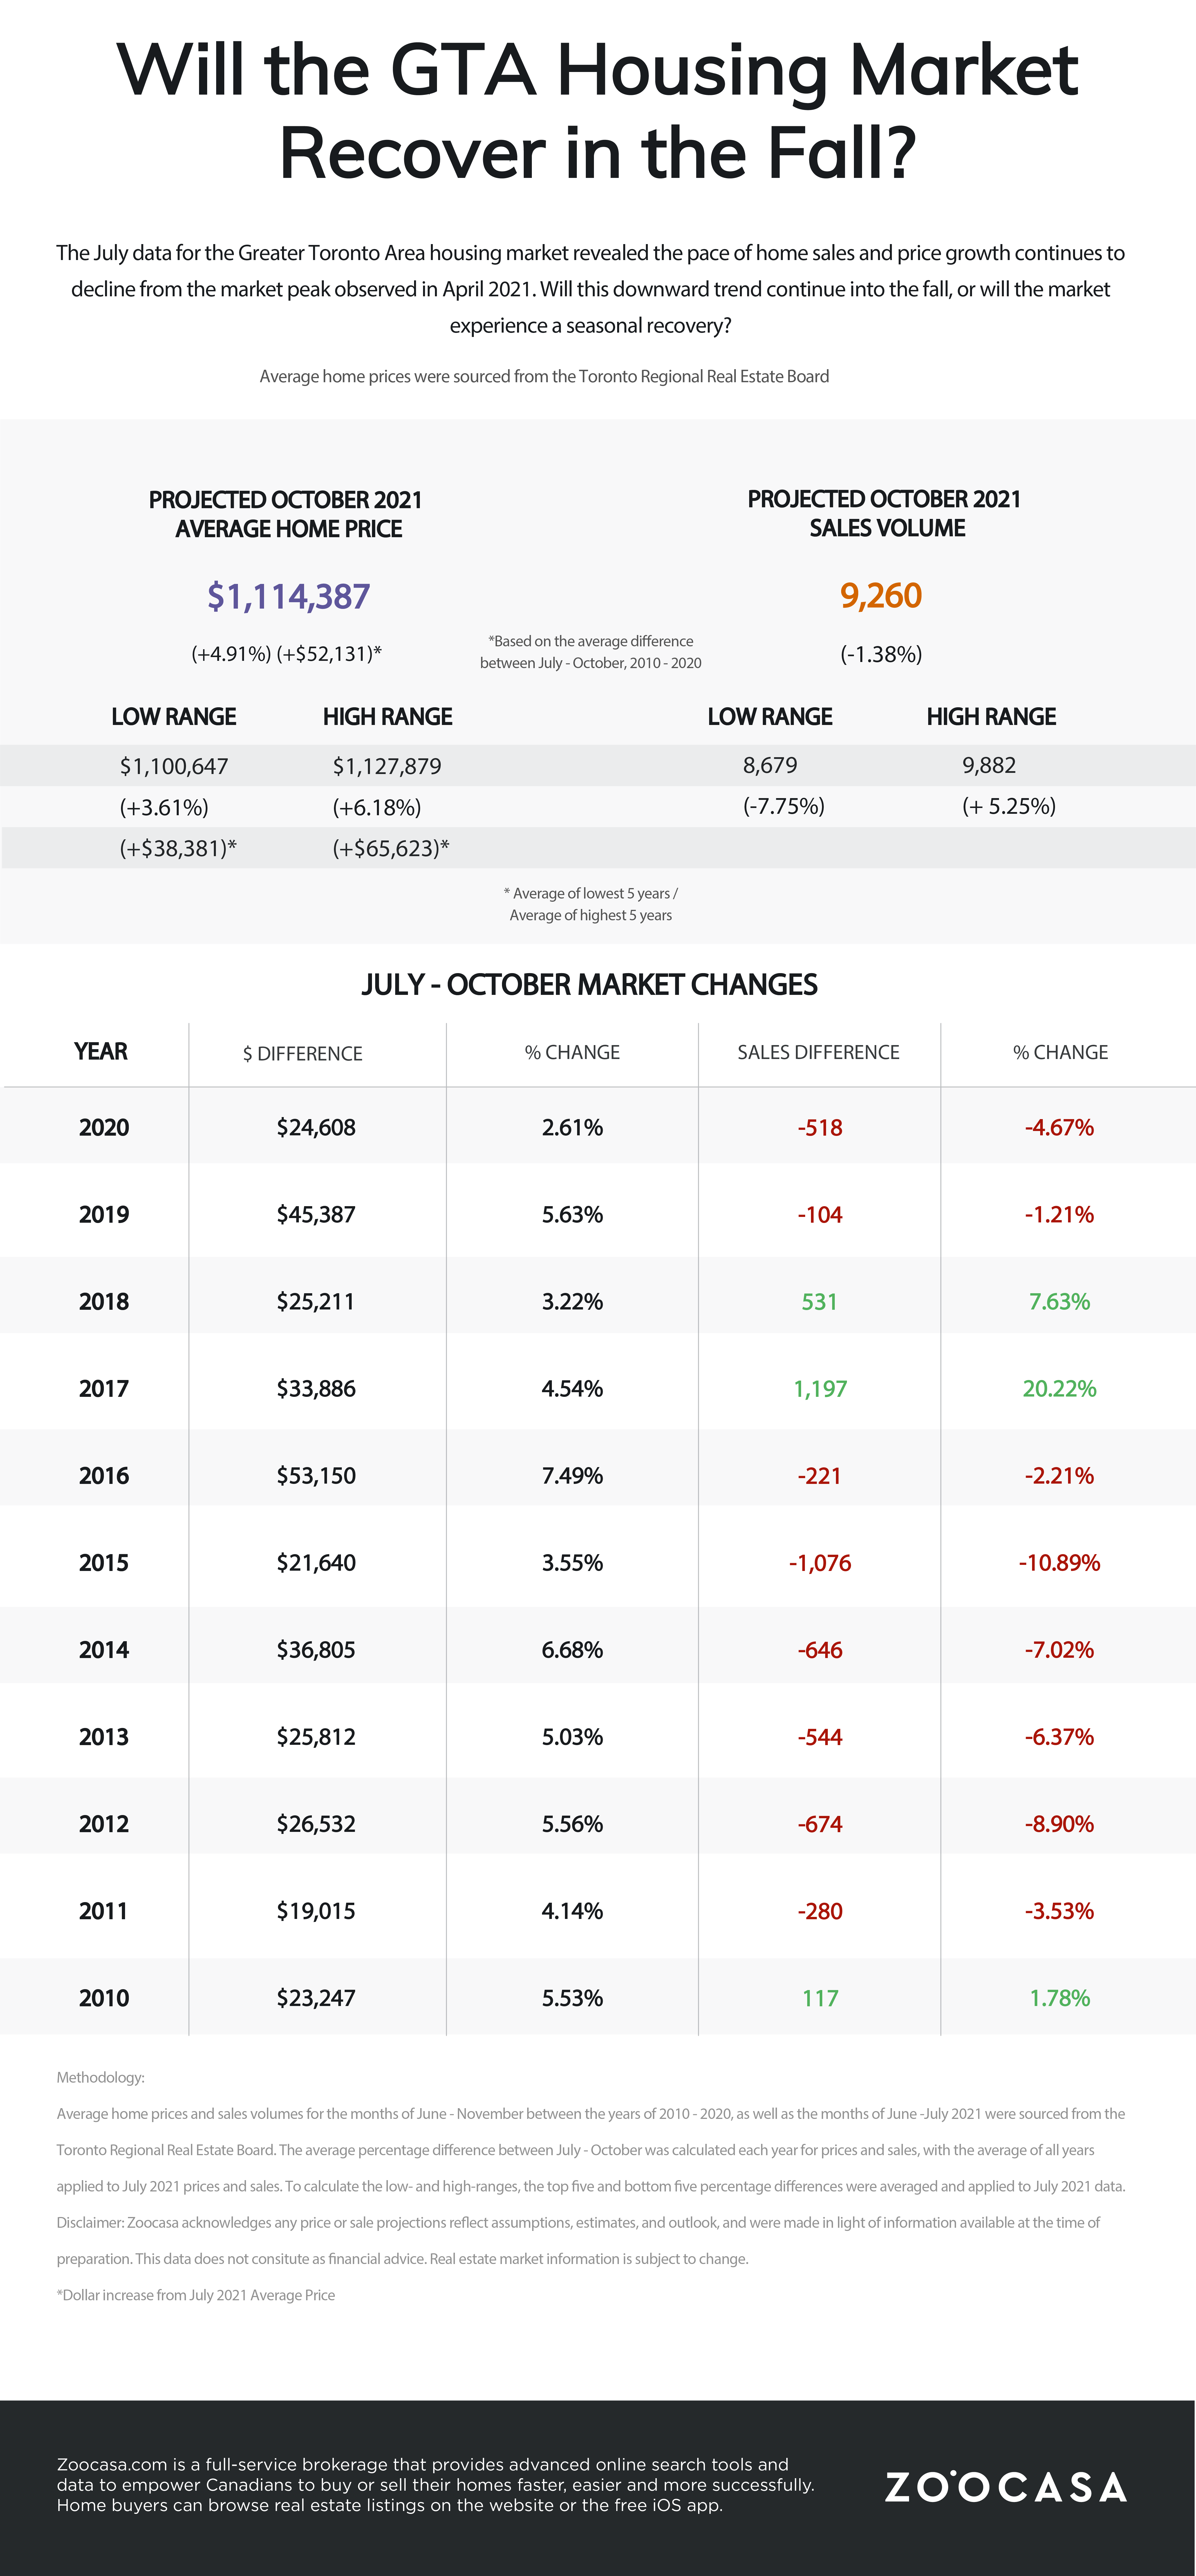 toronto real estate market prediction for fall 2021